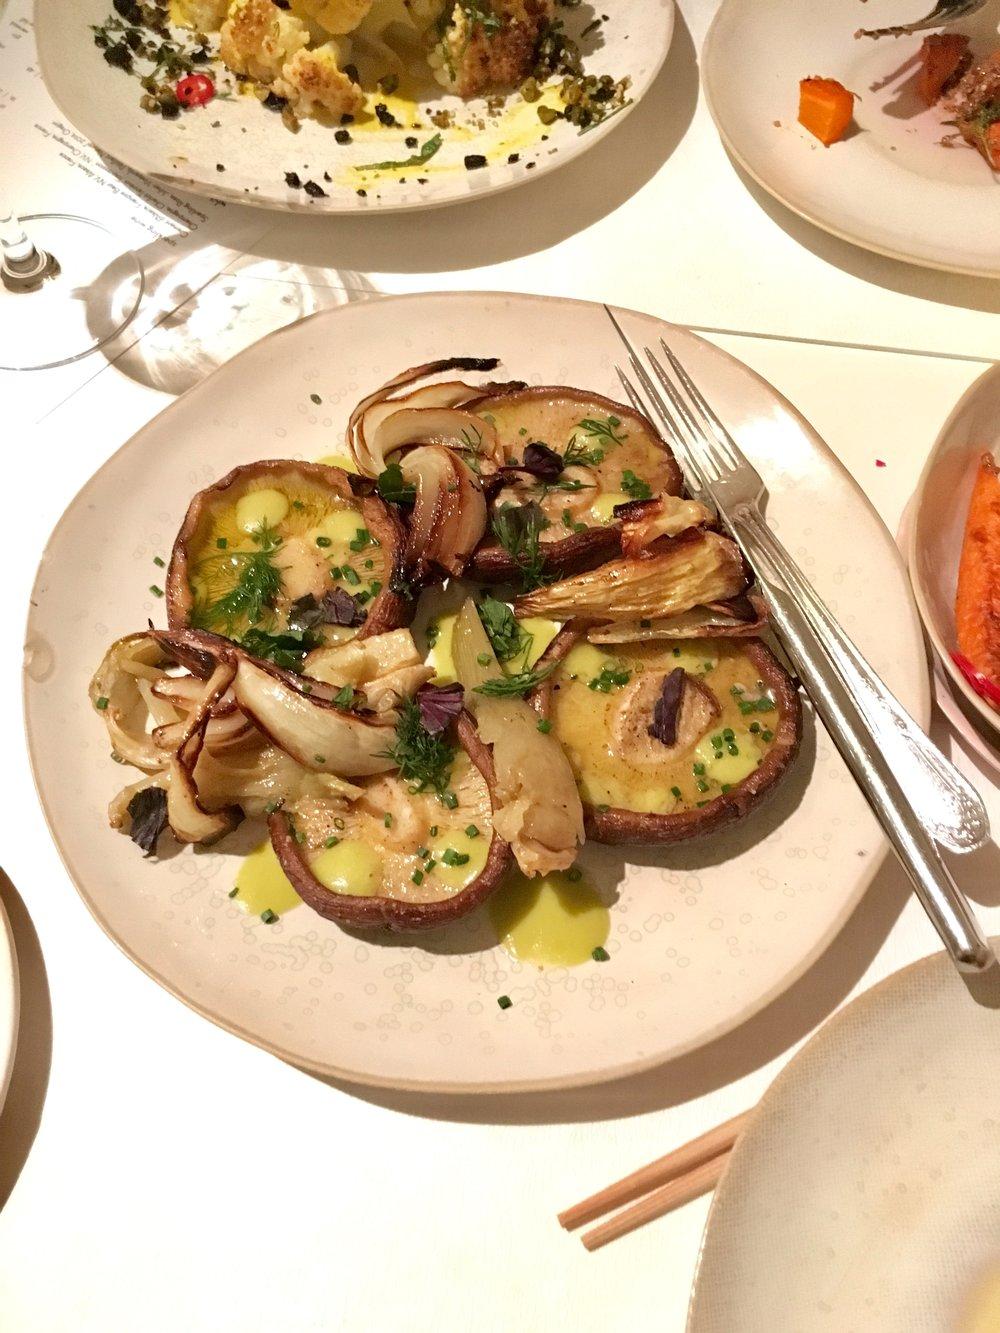 grilled donko shiitake, spring onions, caramelized fennel, yuzukosho green goddess